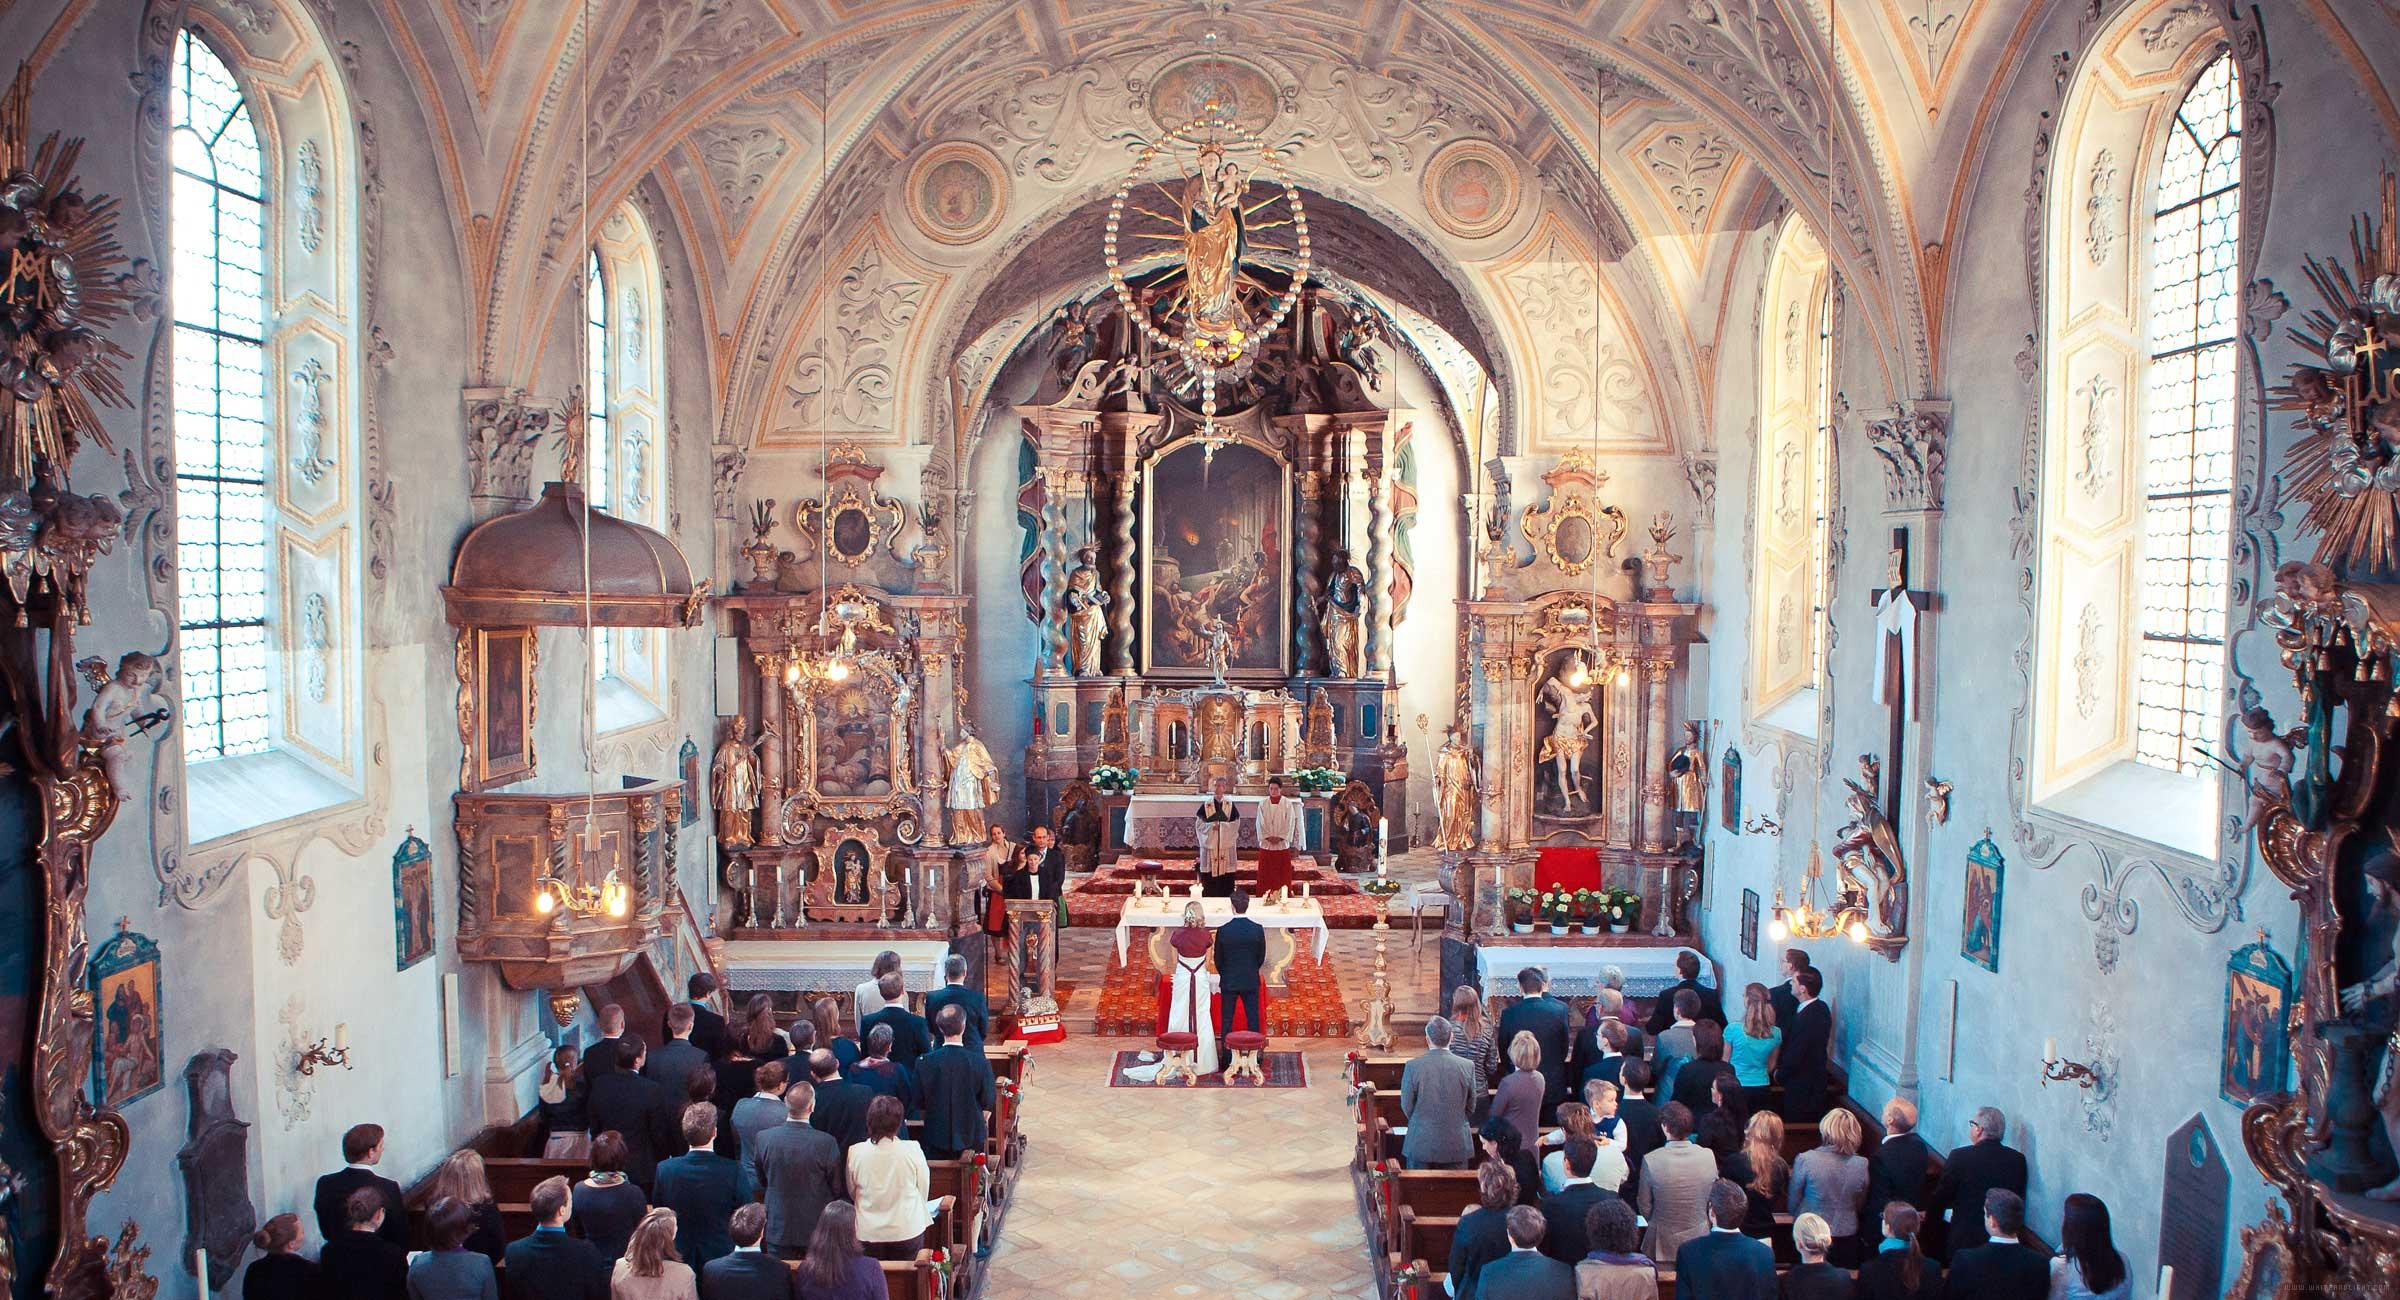 Wedding photographer Munich cost